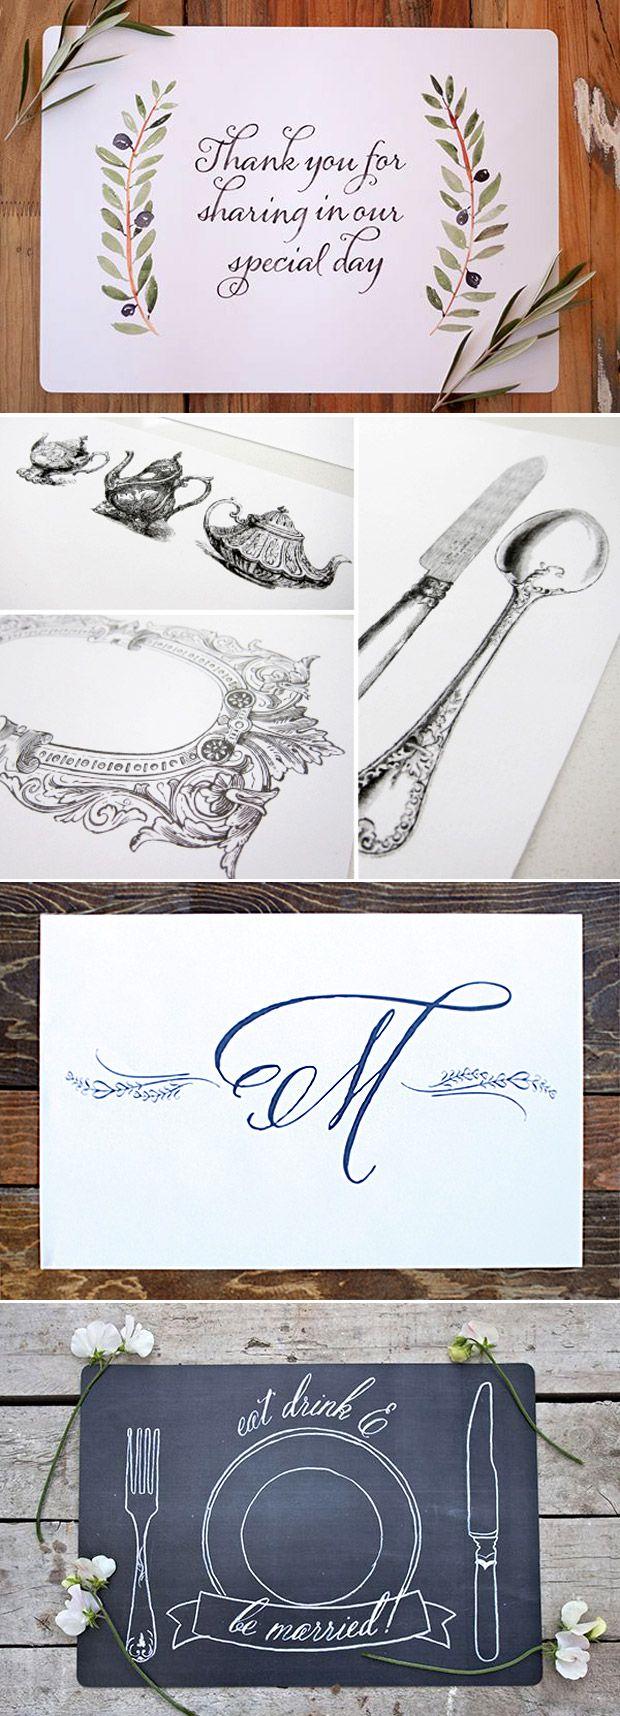 Would You? 5 Unusual Ways To Personalise Your Wedding | weddingsonline